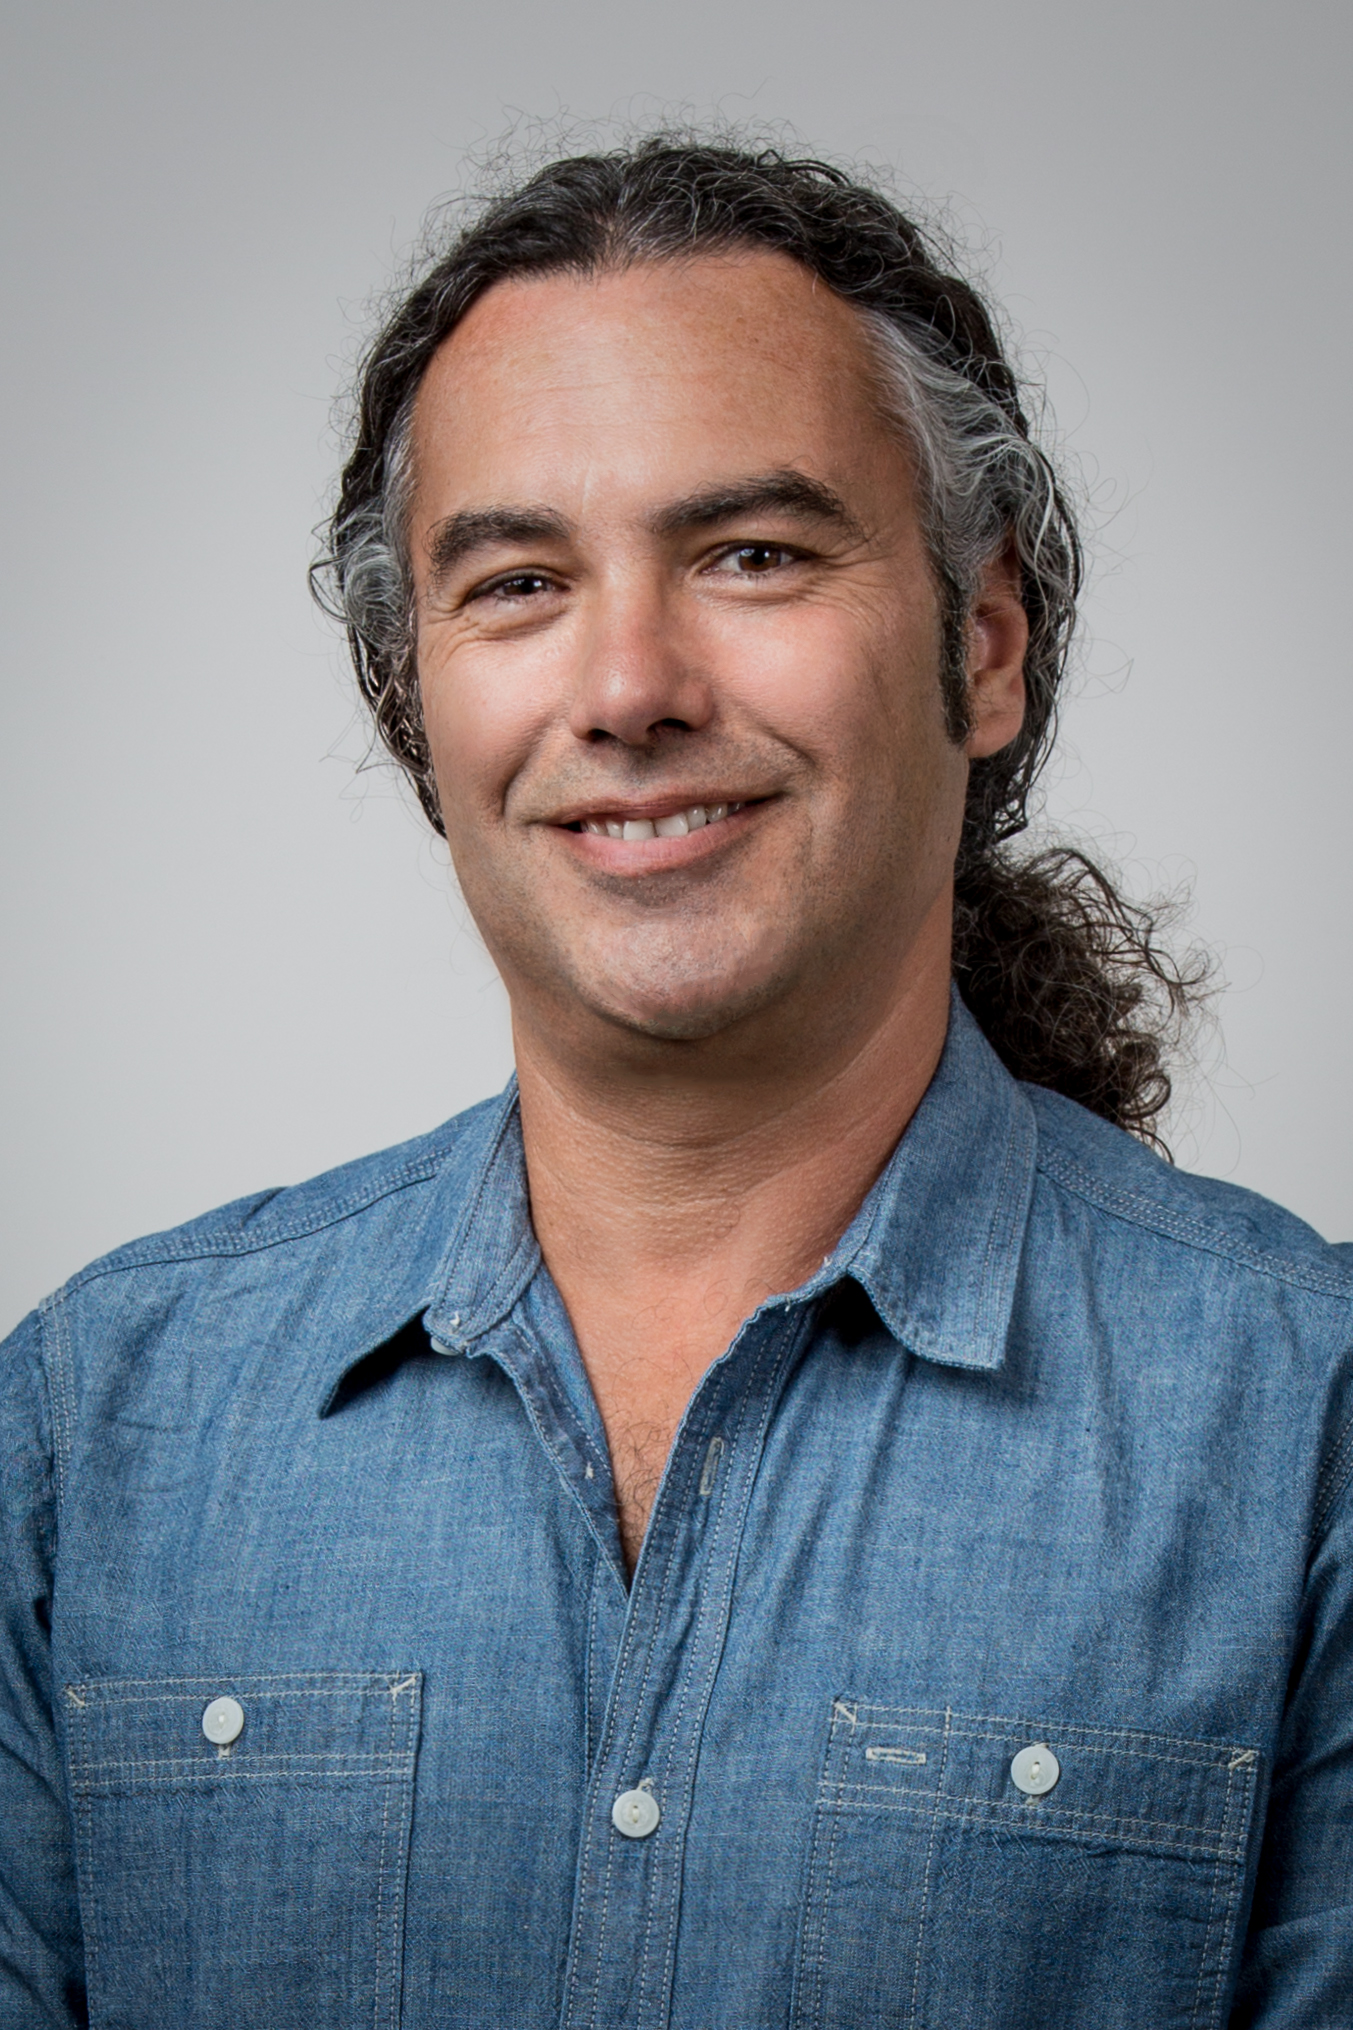 John Delacruz Portrait